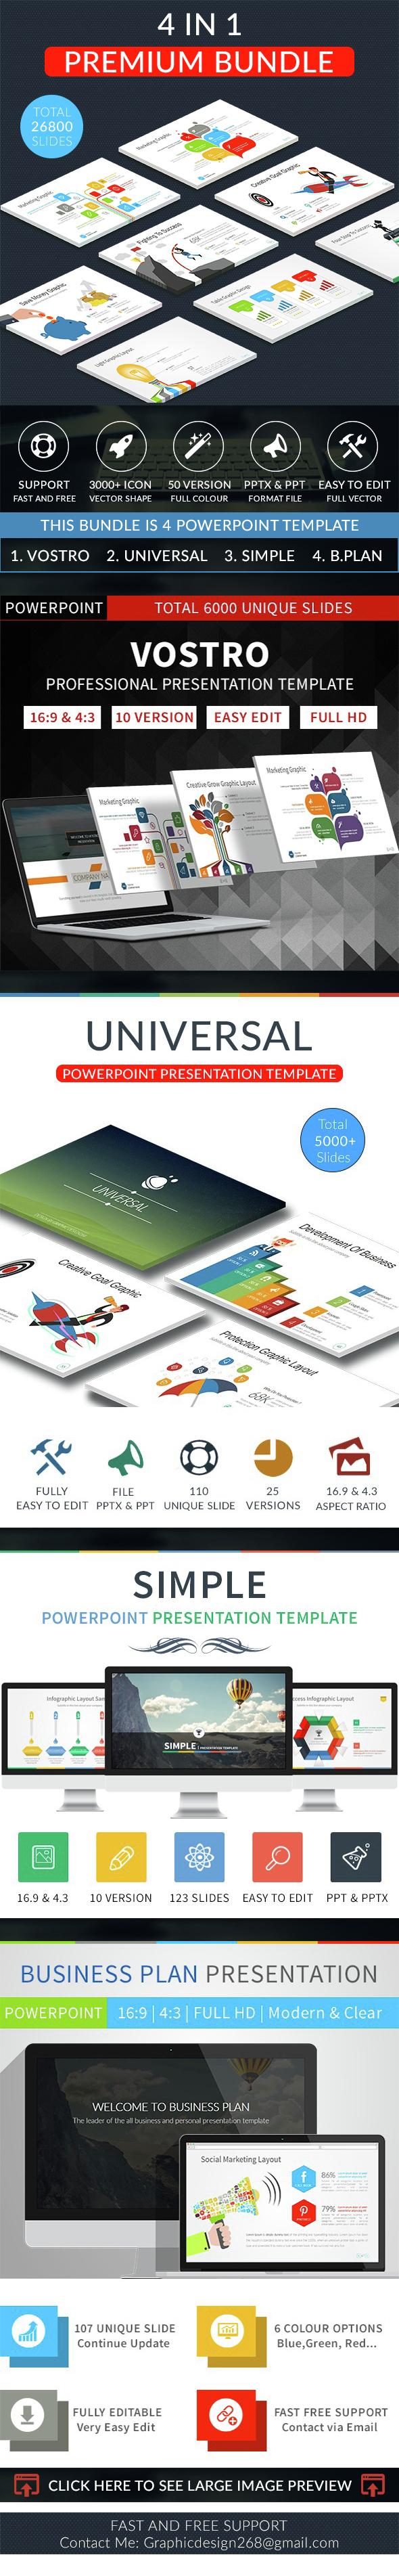 Premium bundle 4 in 1 business powerpoint template by toni777 premium bundle 4 in 1 business powerpoint template flashek Choice Image